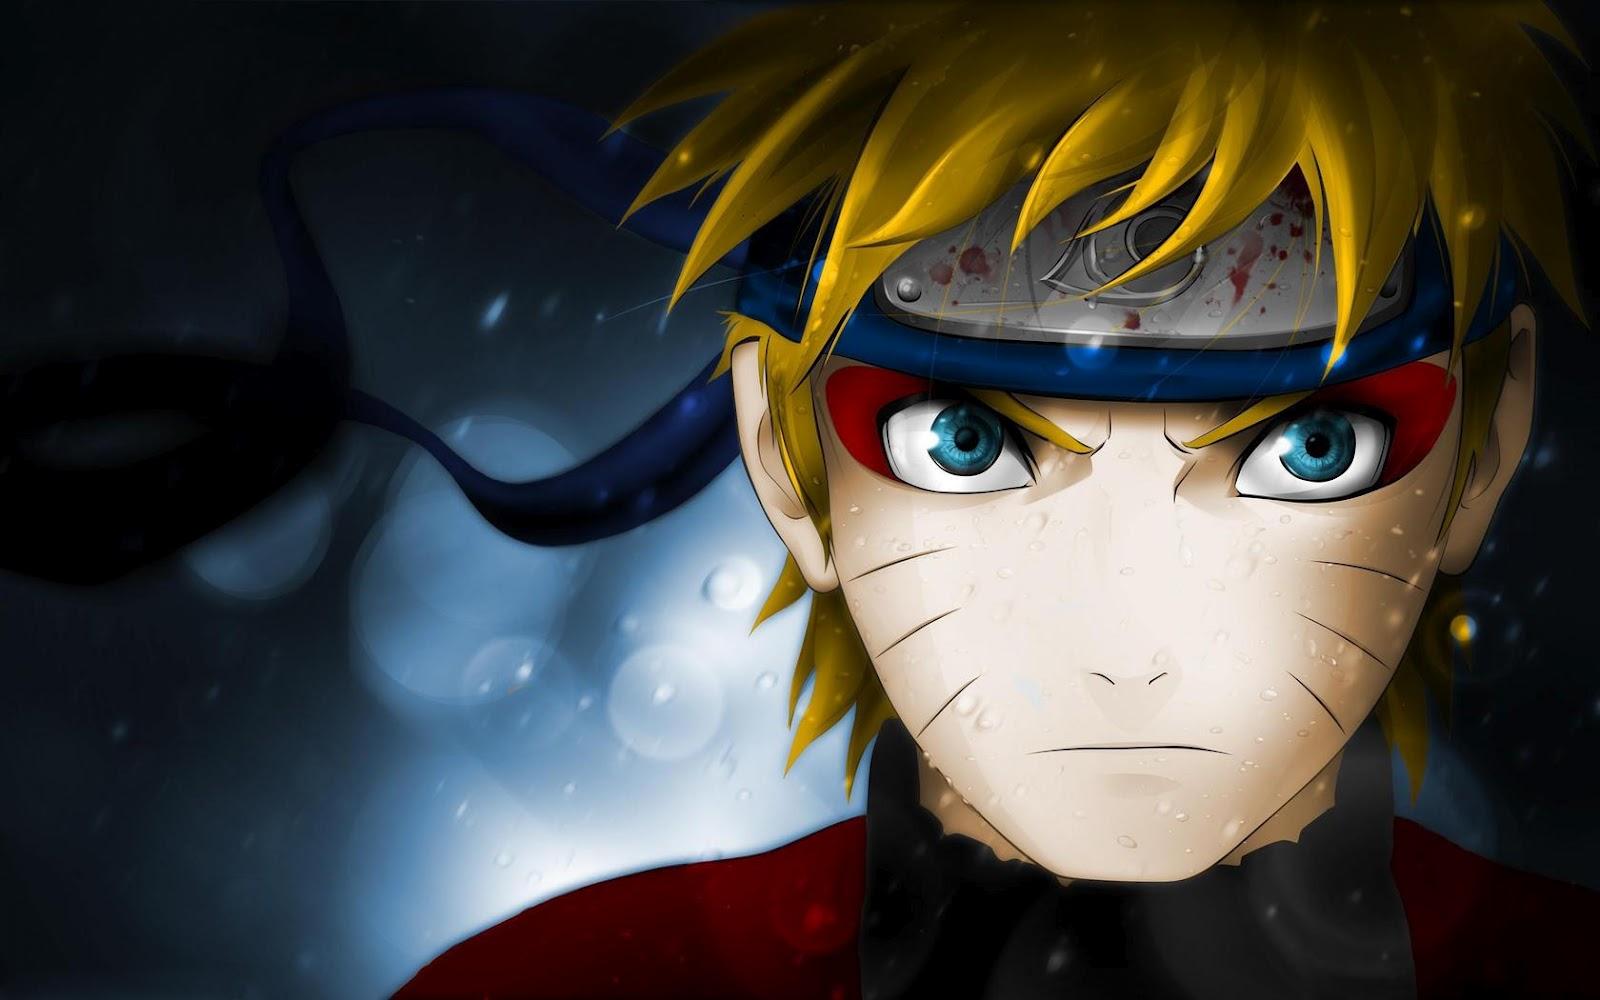 Naruto Uzumaki Anime Character HD Wallpaper Download HD Wallpapers 1600x1000